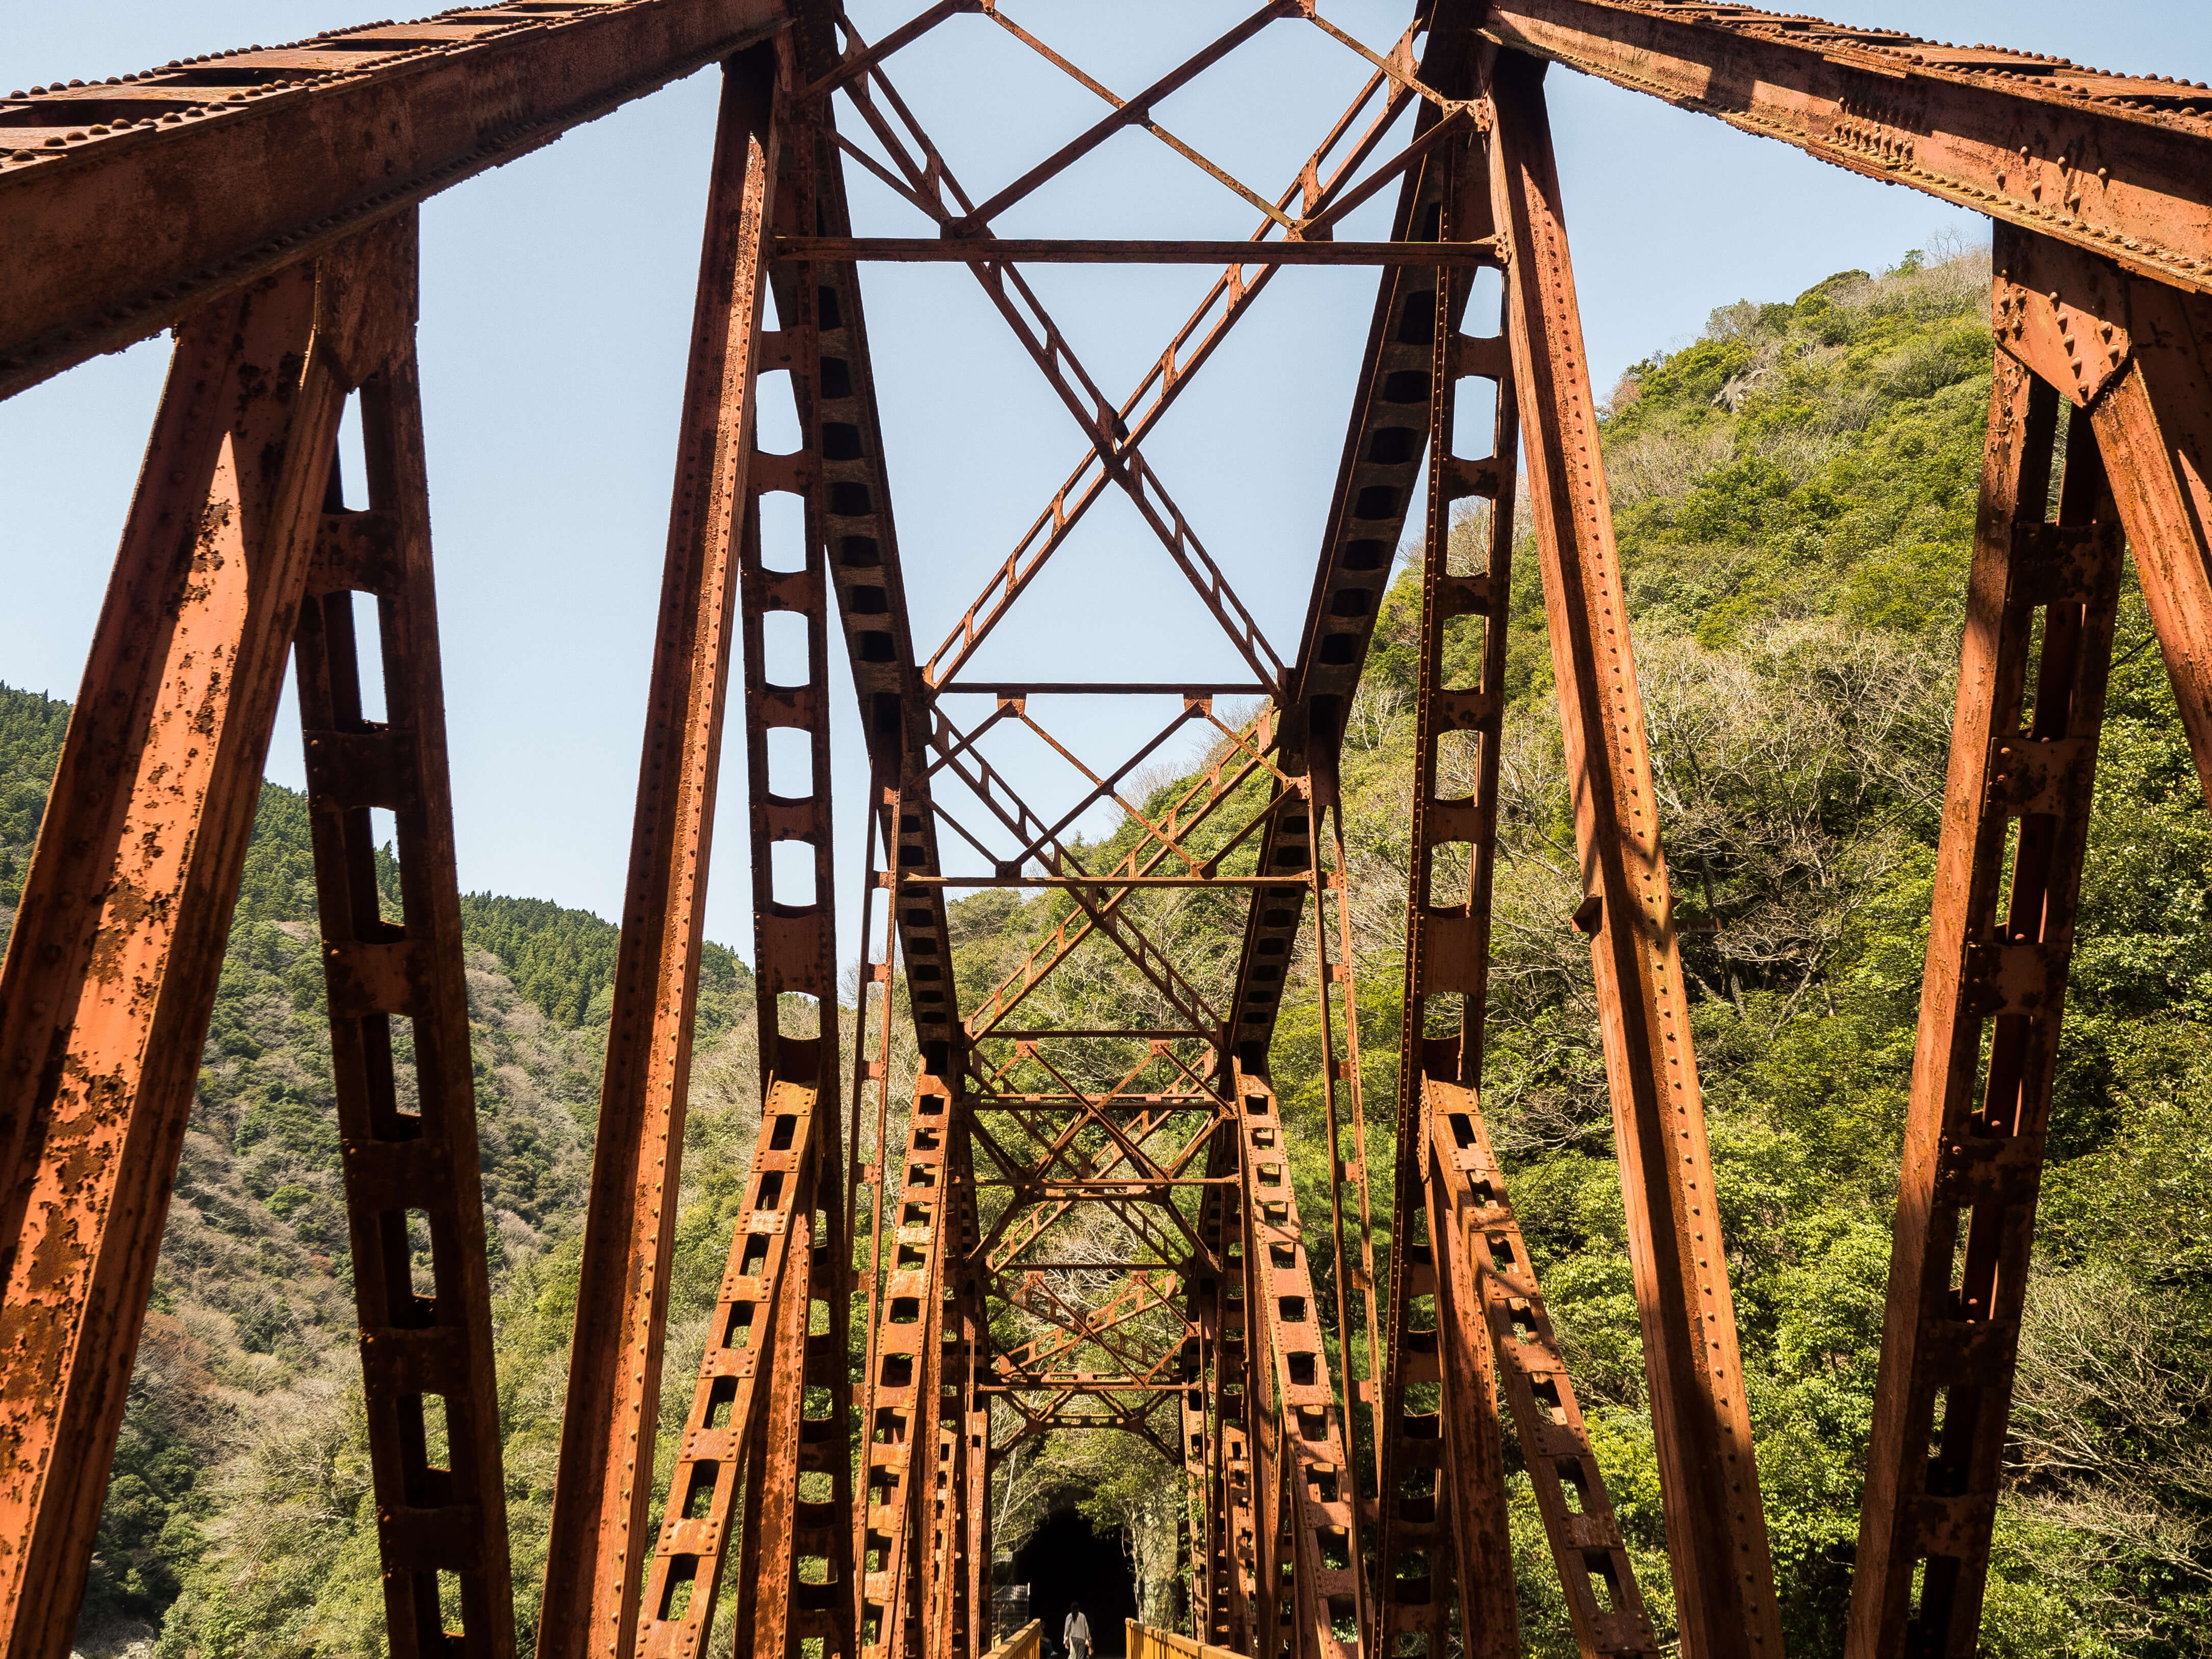 武庫川渓谷の橋梁